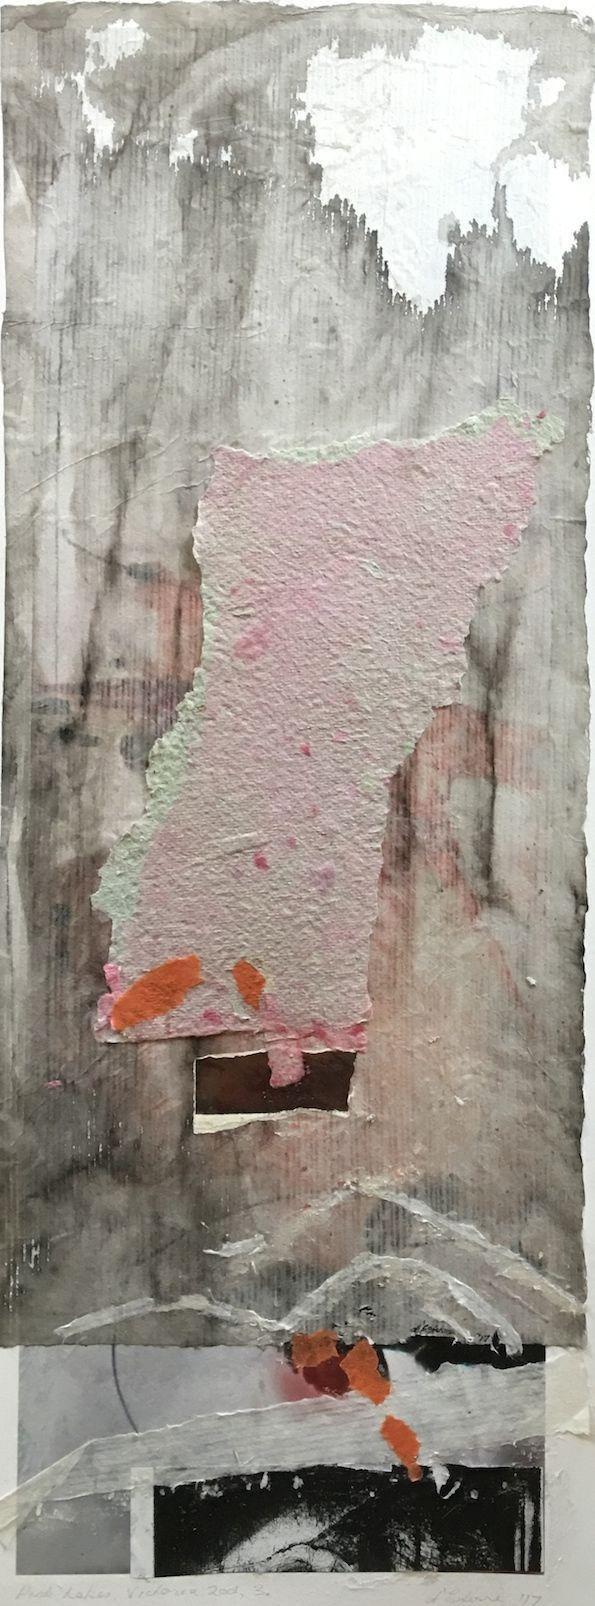 Elaine d'Esterre - The Pink Lakes, Vic., 2003, 3, 2017, indian ink wash, hand made paper, rice paper & intaglio, 75x30 cm. Visit my ART BLOG at http://elainedesterreart.com/ and http://www.facebook.com/elainedesterreart/ and http://instagram.com/desterreart/